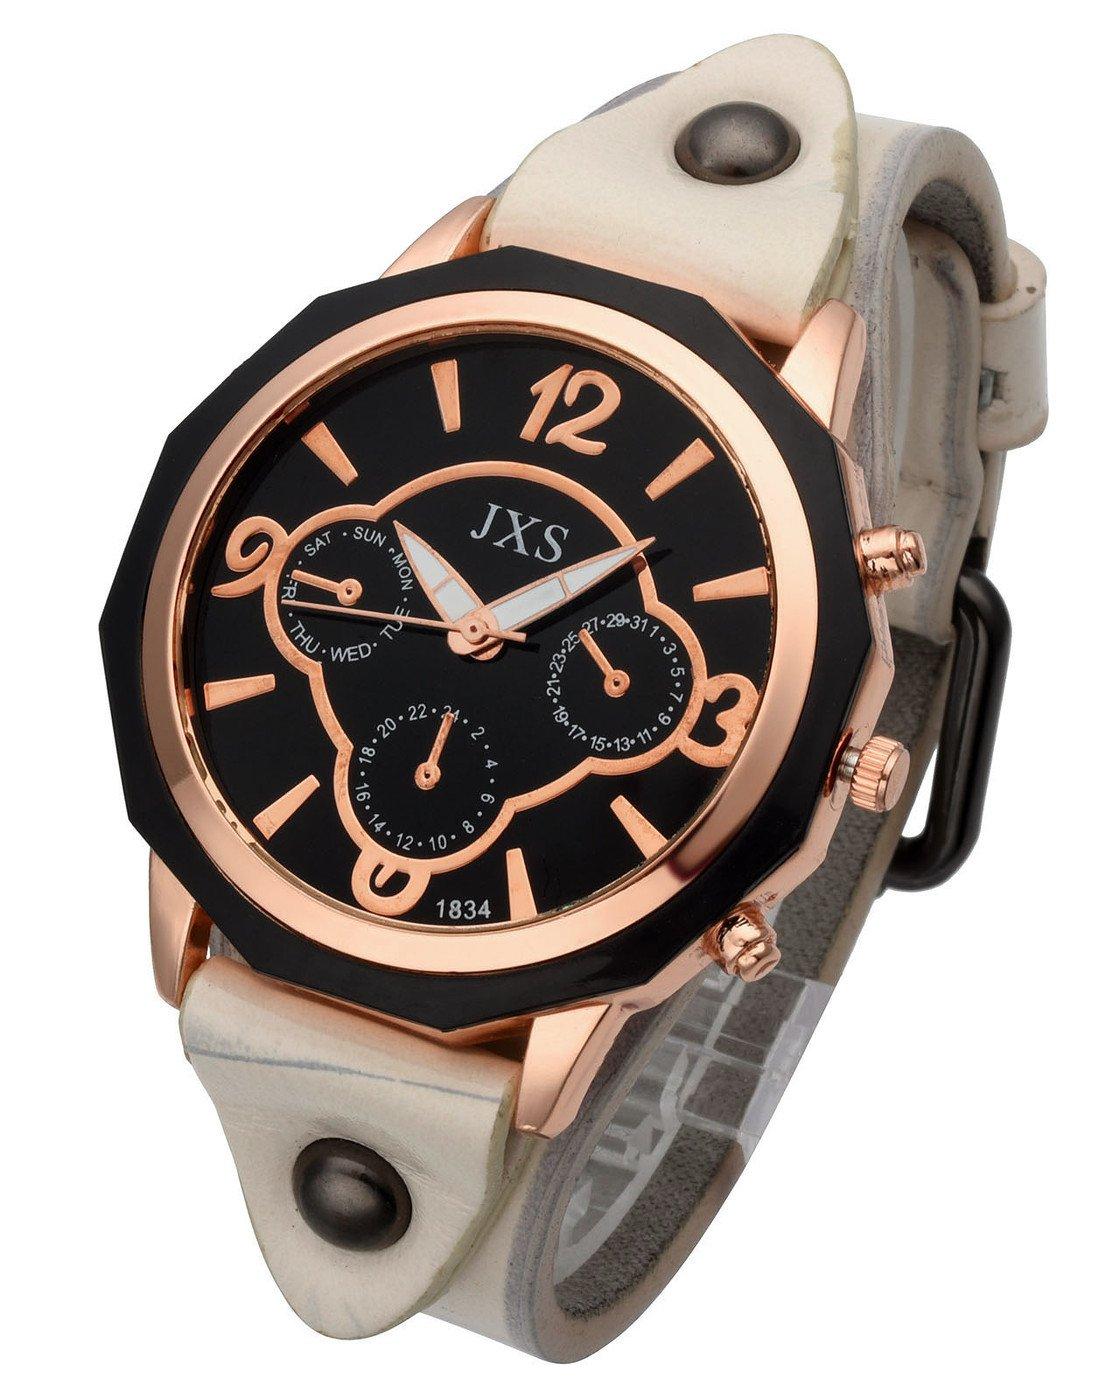 Top Plaza Womens Mens Fashion Rose Gold Tone Leather Analog Quartz Wrist Watch Arabic Numerals Big Face Casual Sport Watch - White